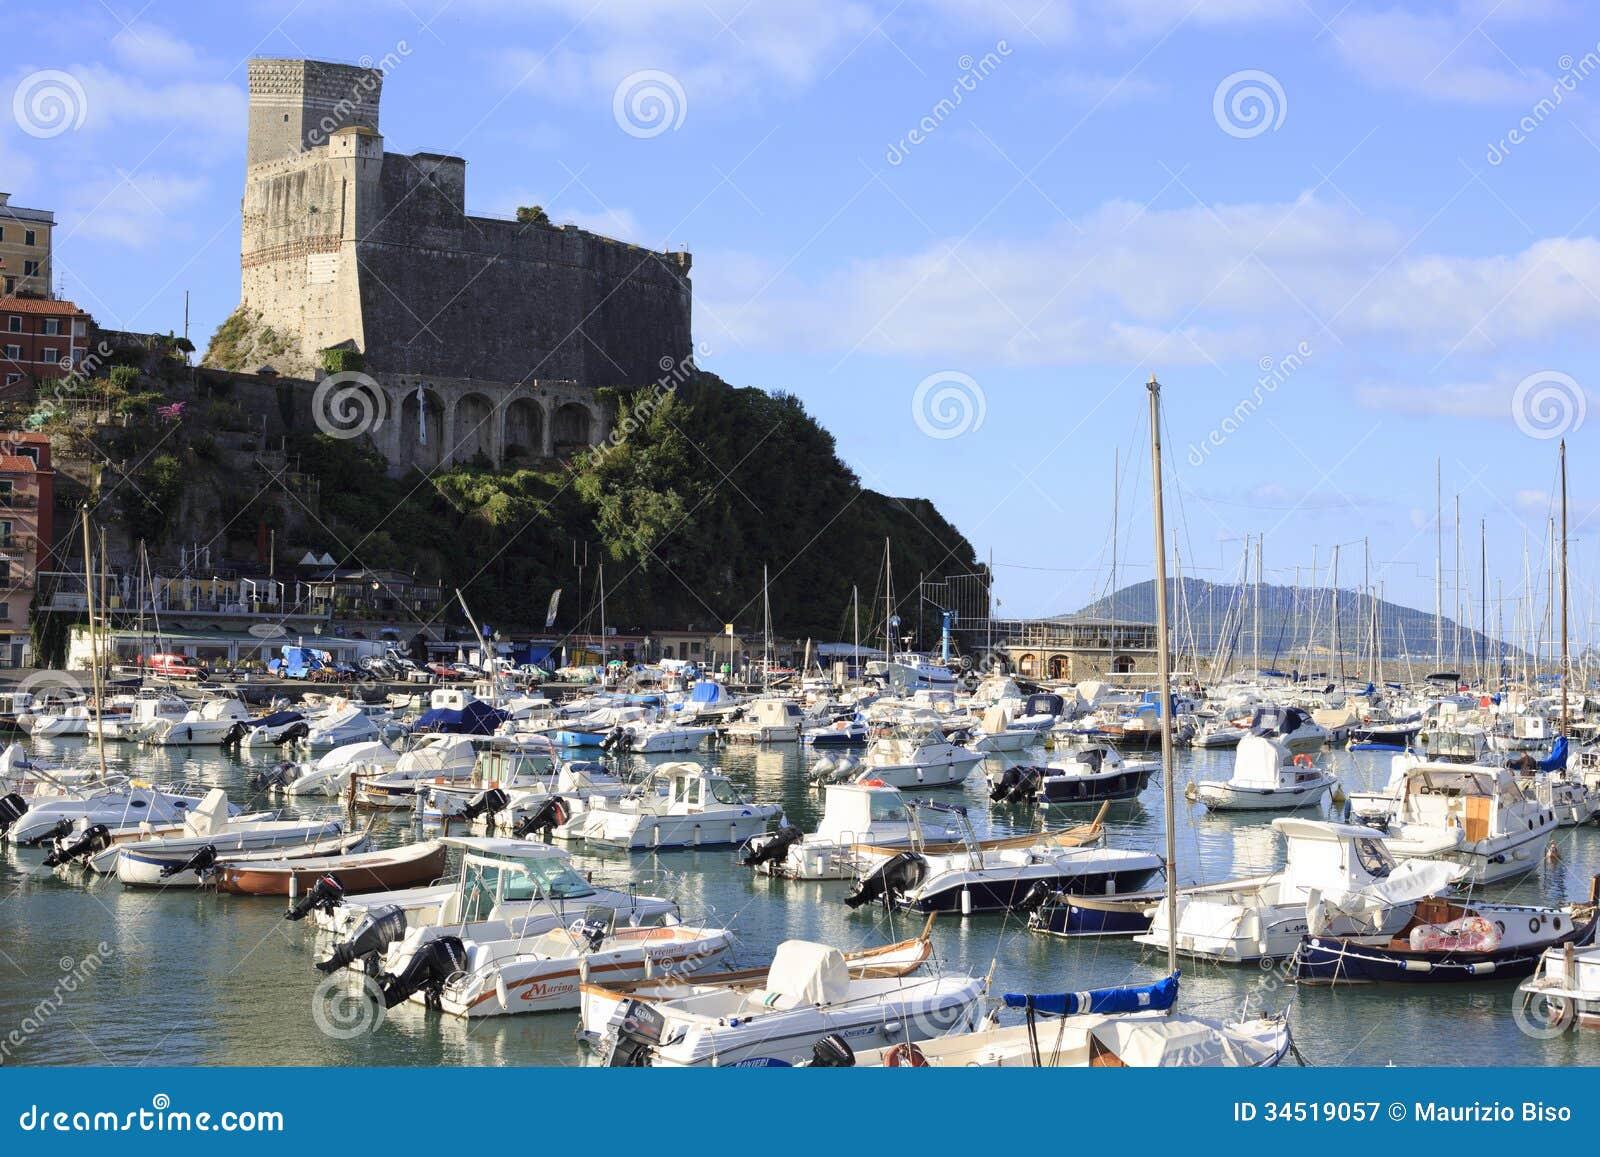 Harbor and old town of lerici editorial photography for Marletto arredamenti la spezia